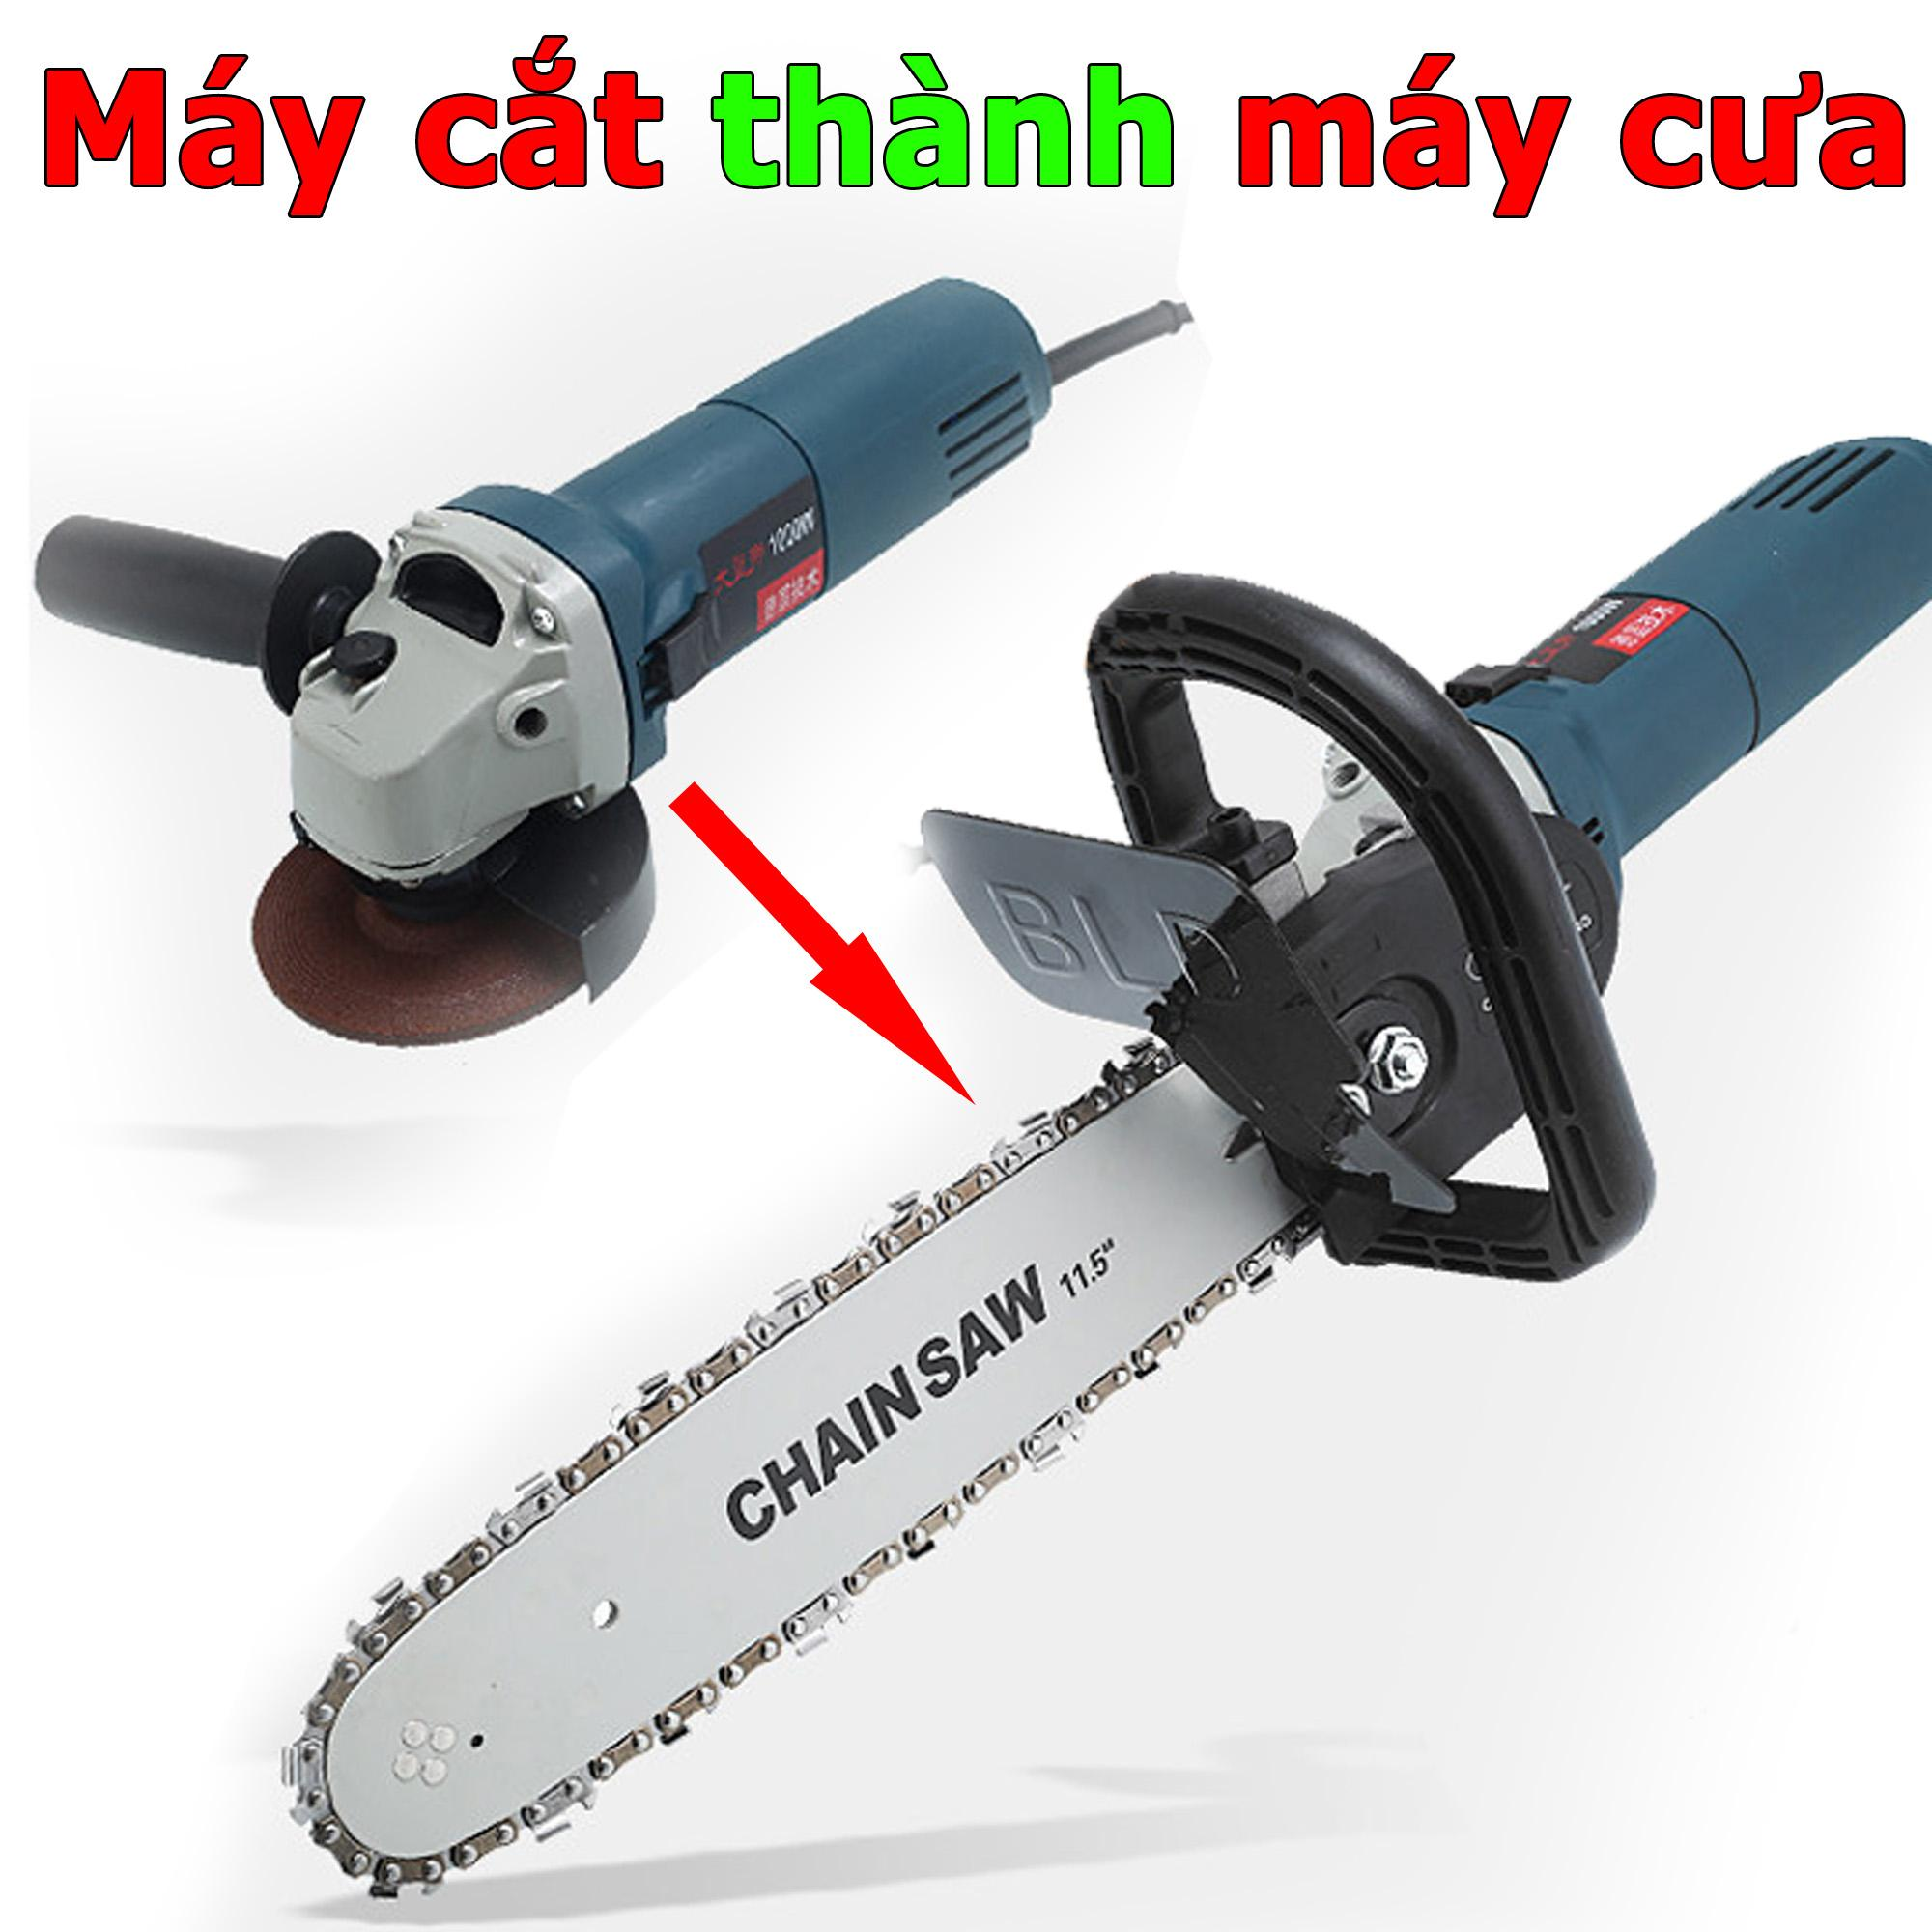 Lưỡi cưa gắn máy cắt cầm tay - Bộ chuyển máy cắt thành máy cưa